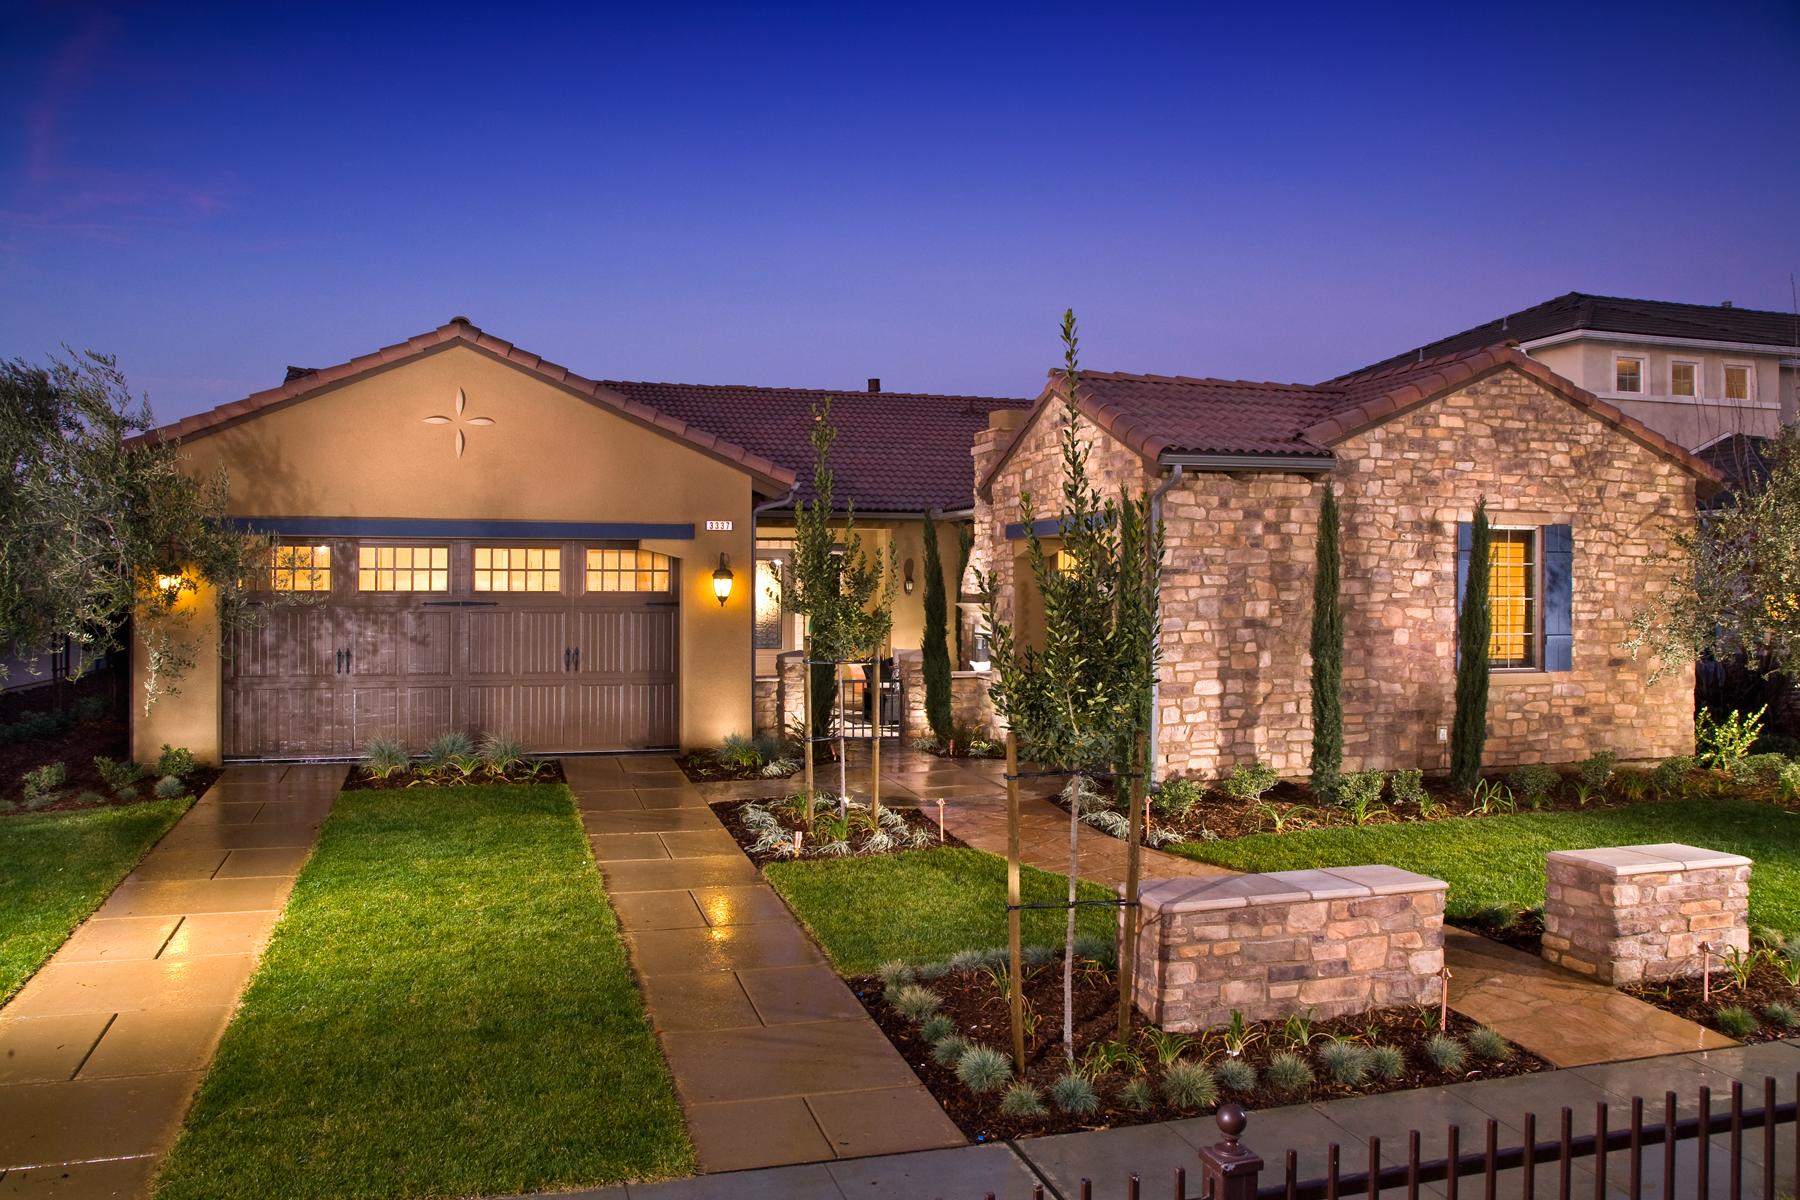 beautiful-homes-www.PlayHouses4Kidz.com-58